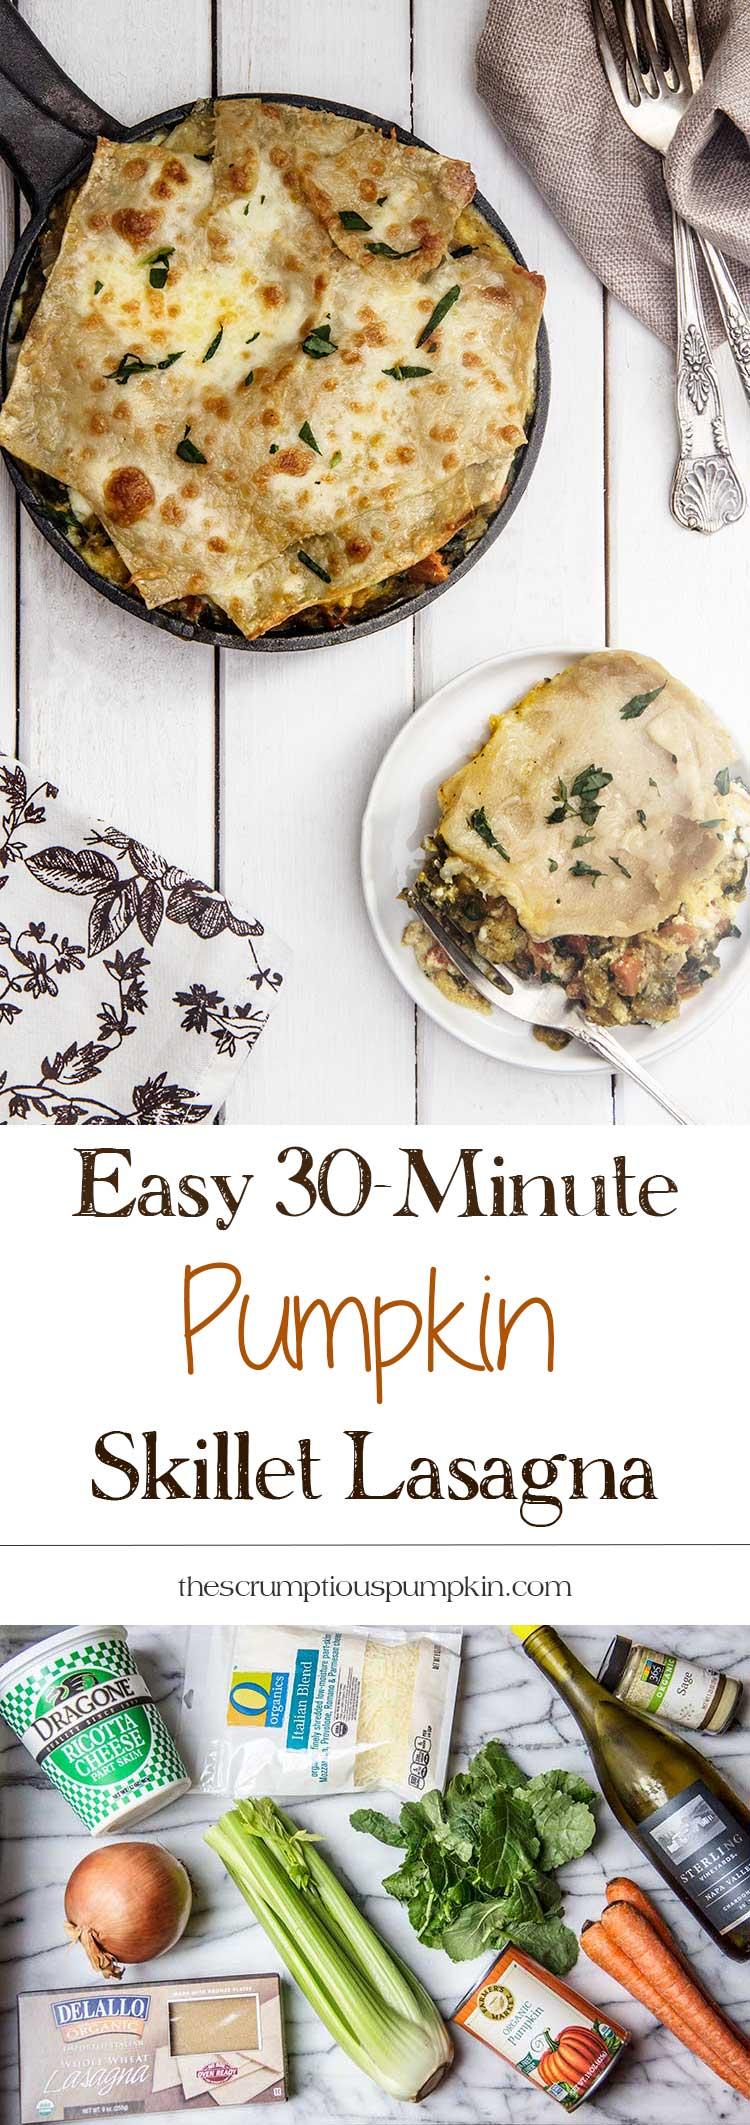 easy-30-minute-pumpkin-skillet-lasagna